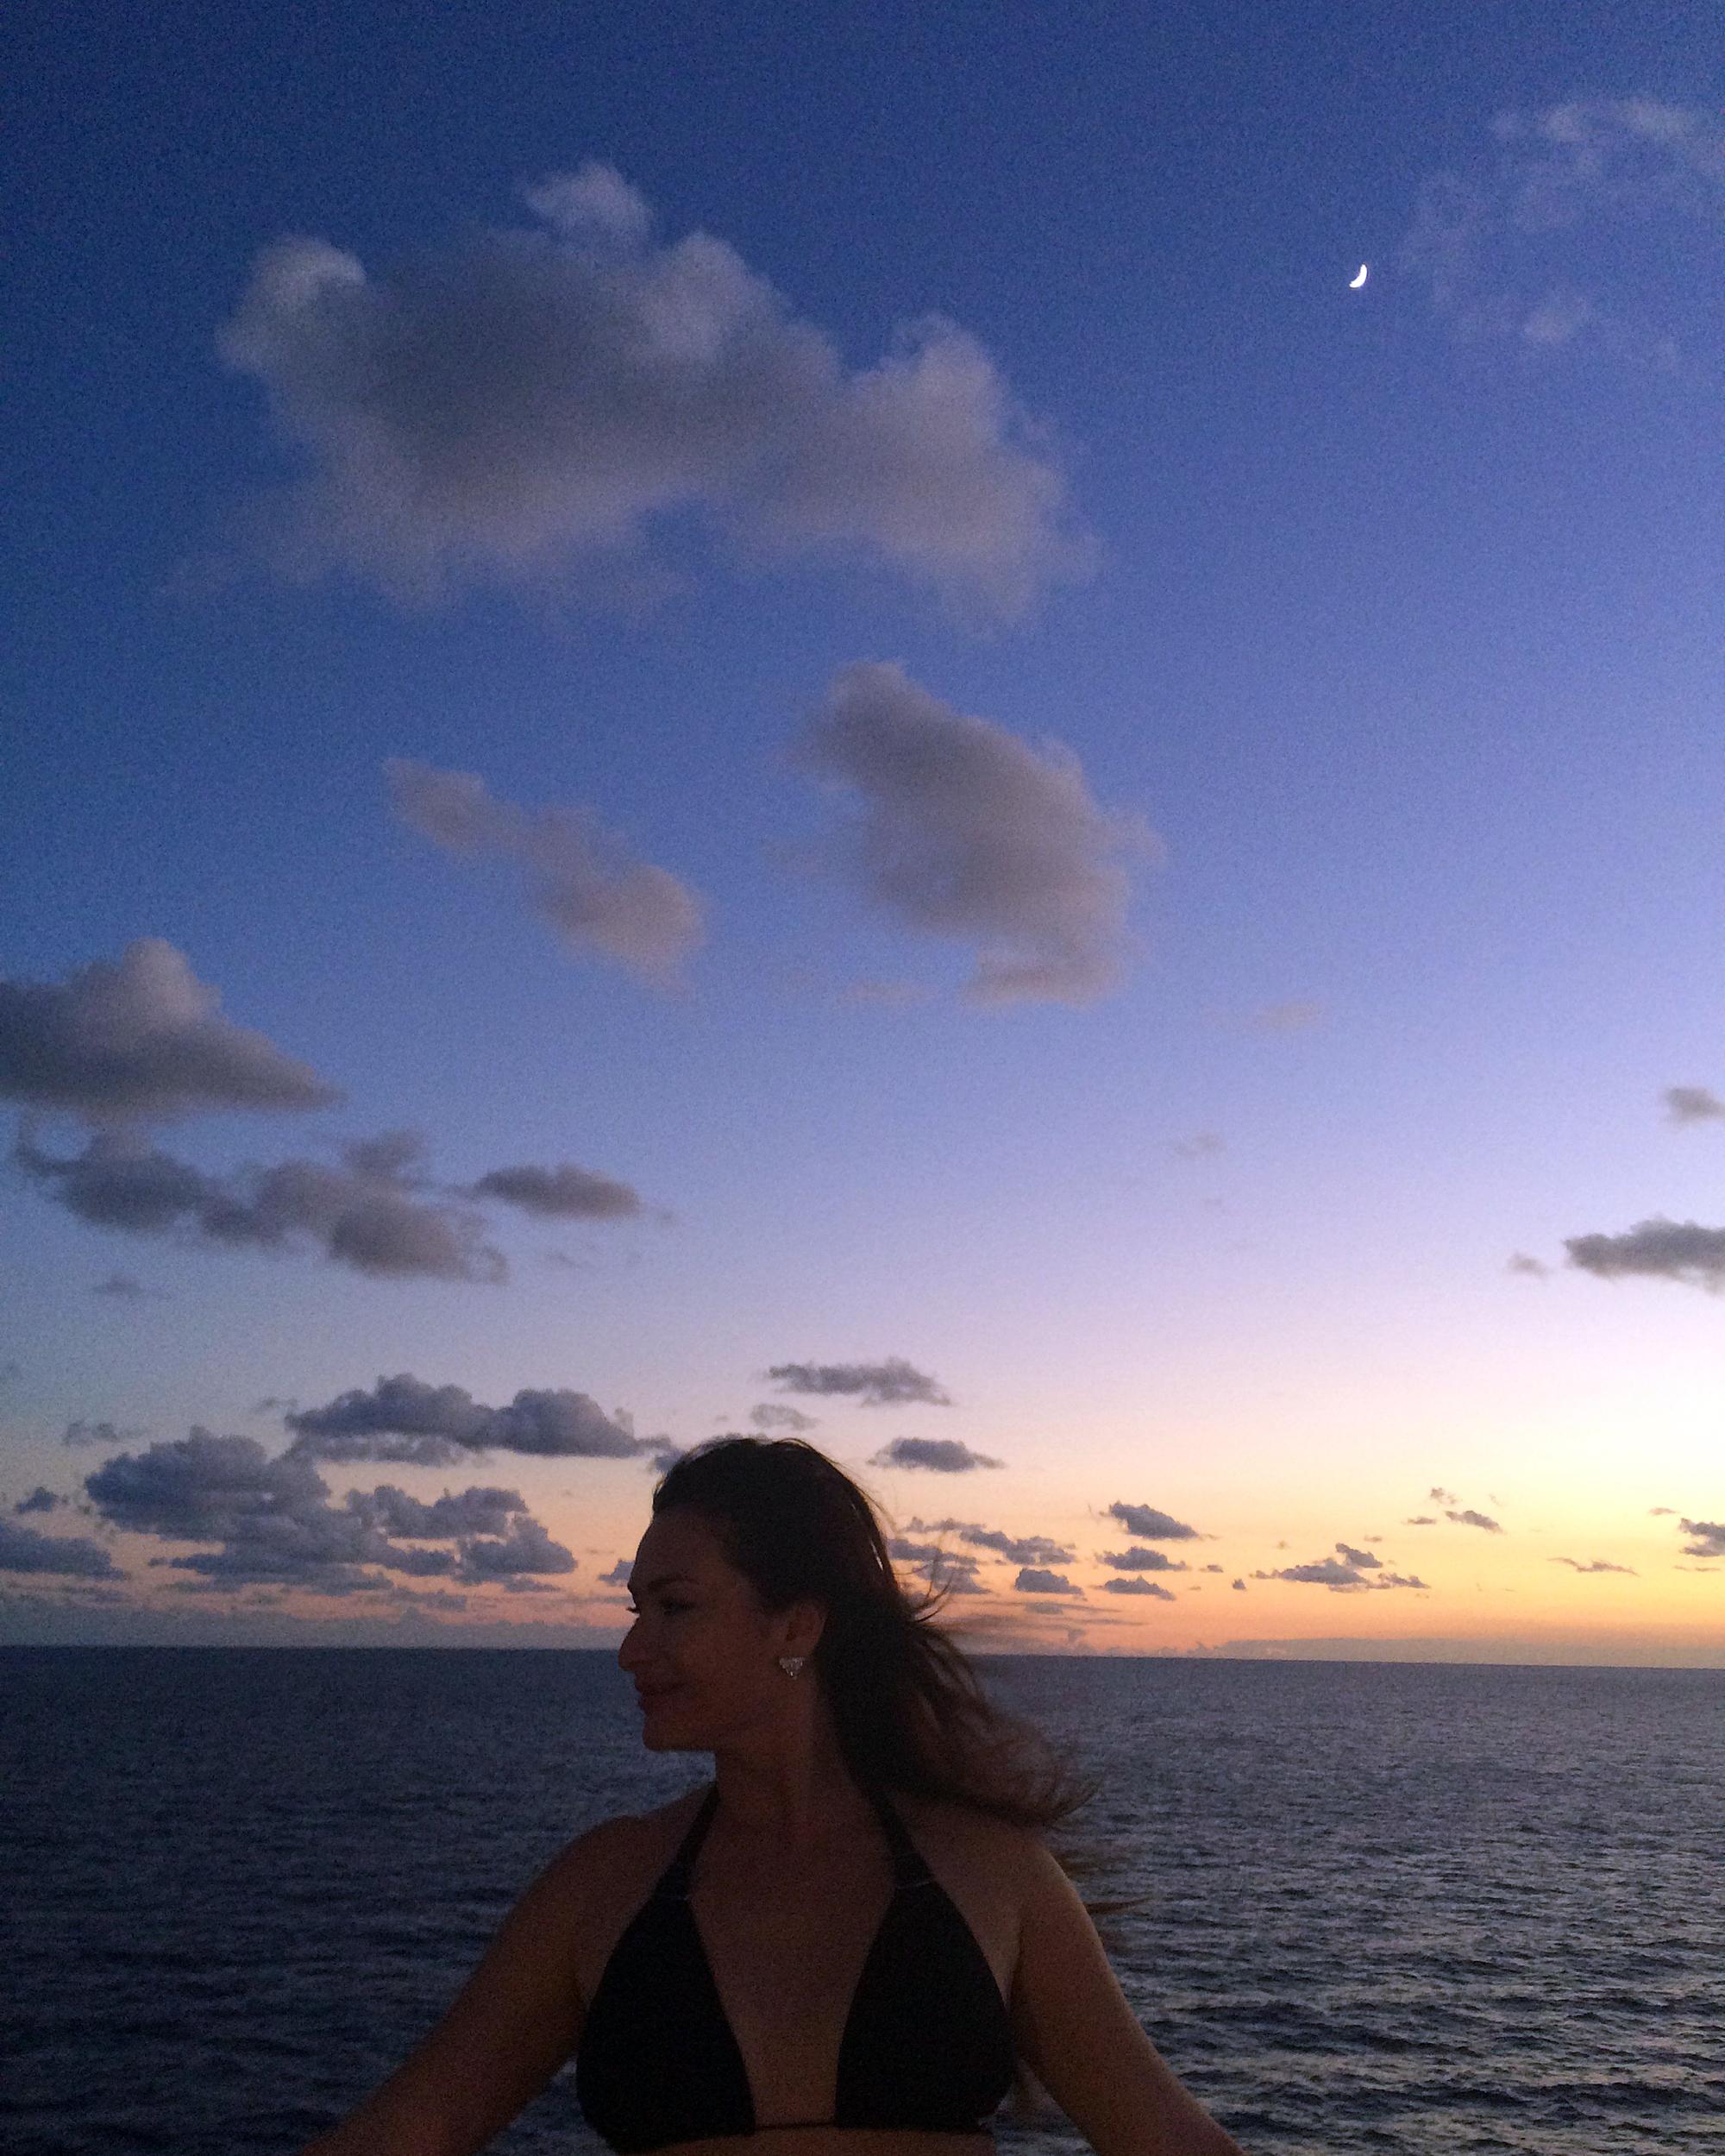 alegria-onboard-aventura-dance-cruise-01